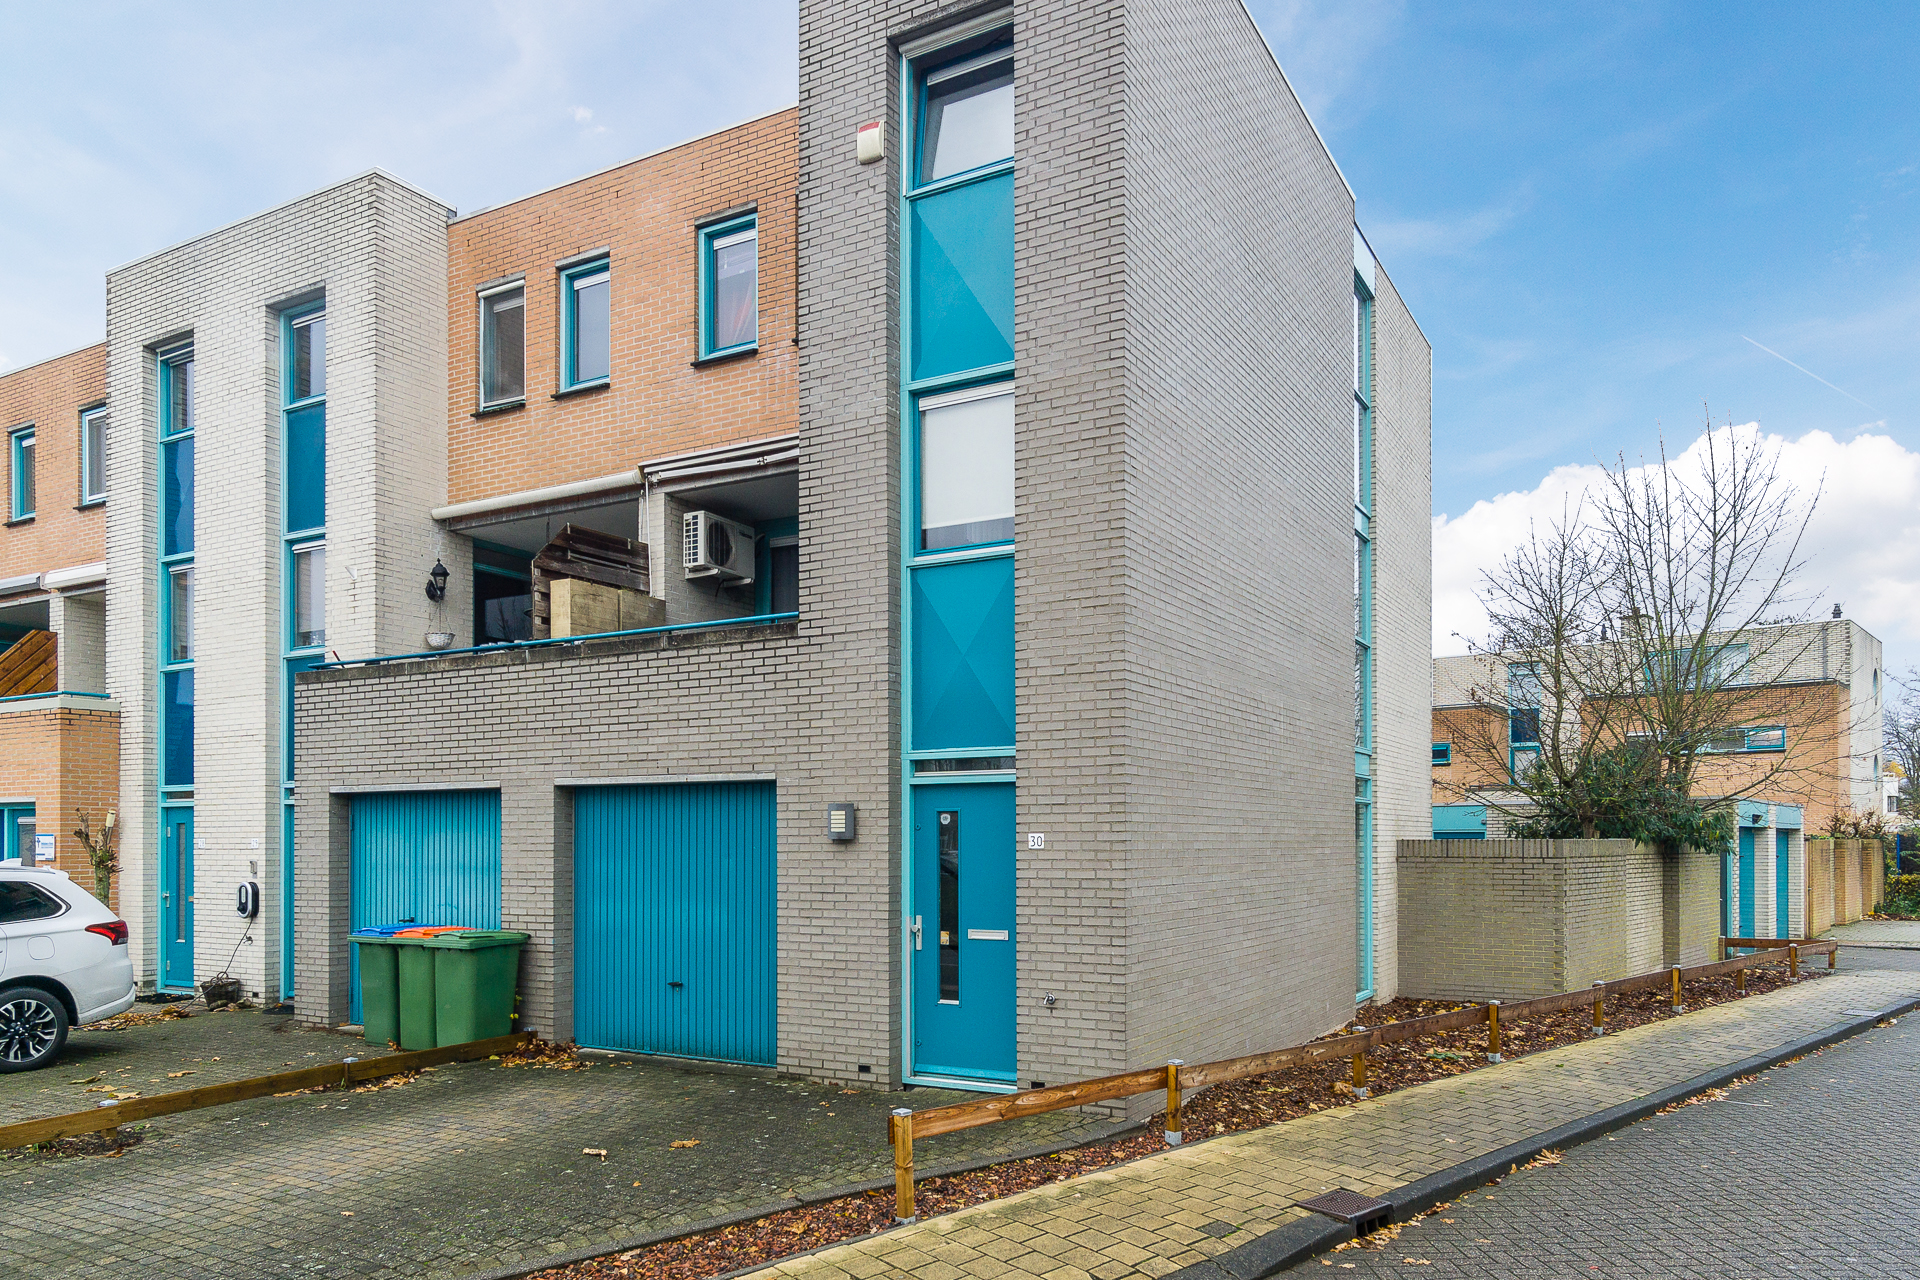 Badkamers Tilburg 587fsj. Interesting Affordable Elegant Hob Onzeli ...